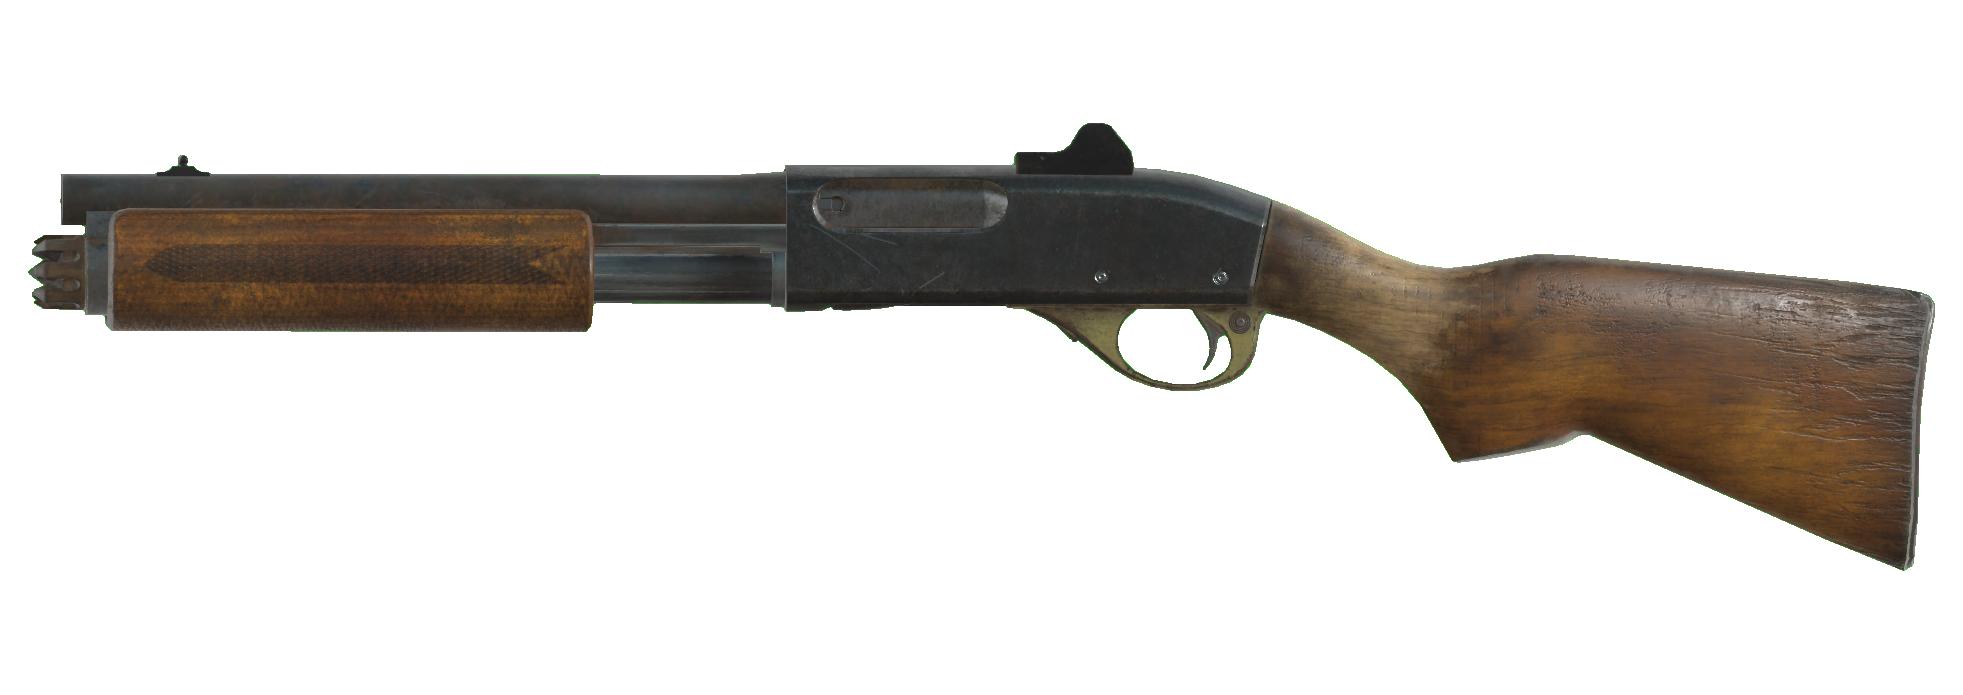 Pump action shotgun (Fallout 76)